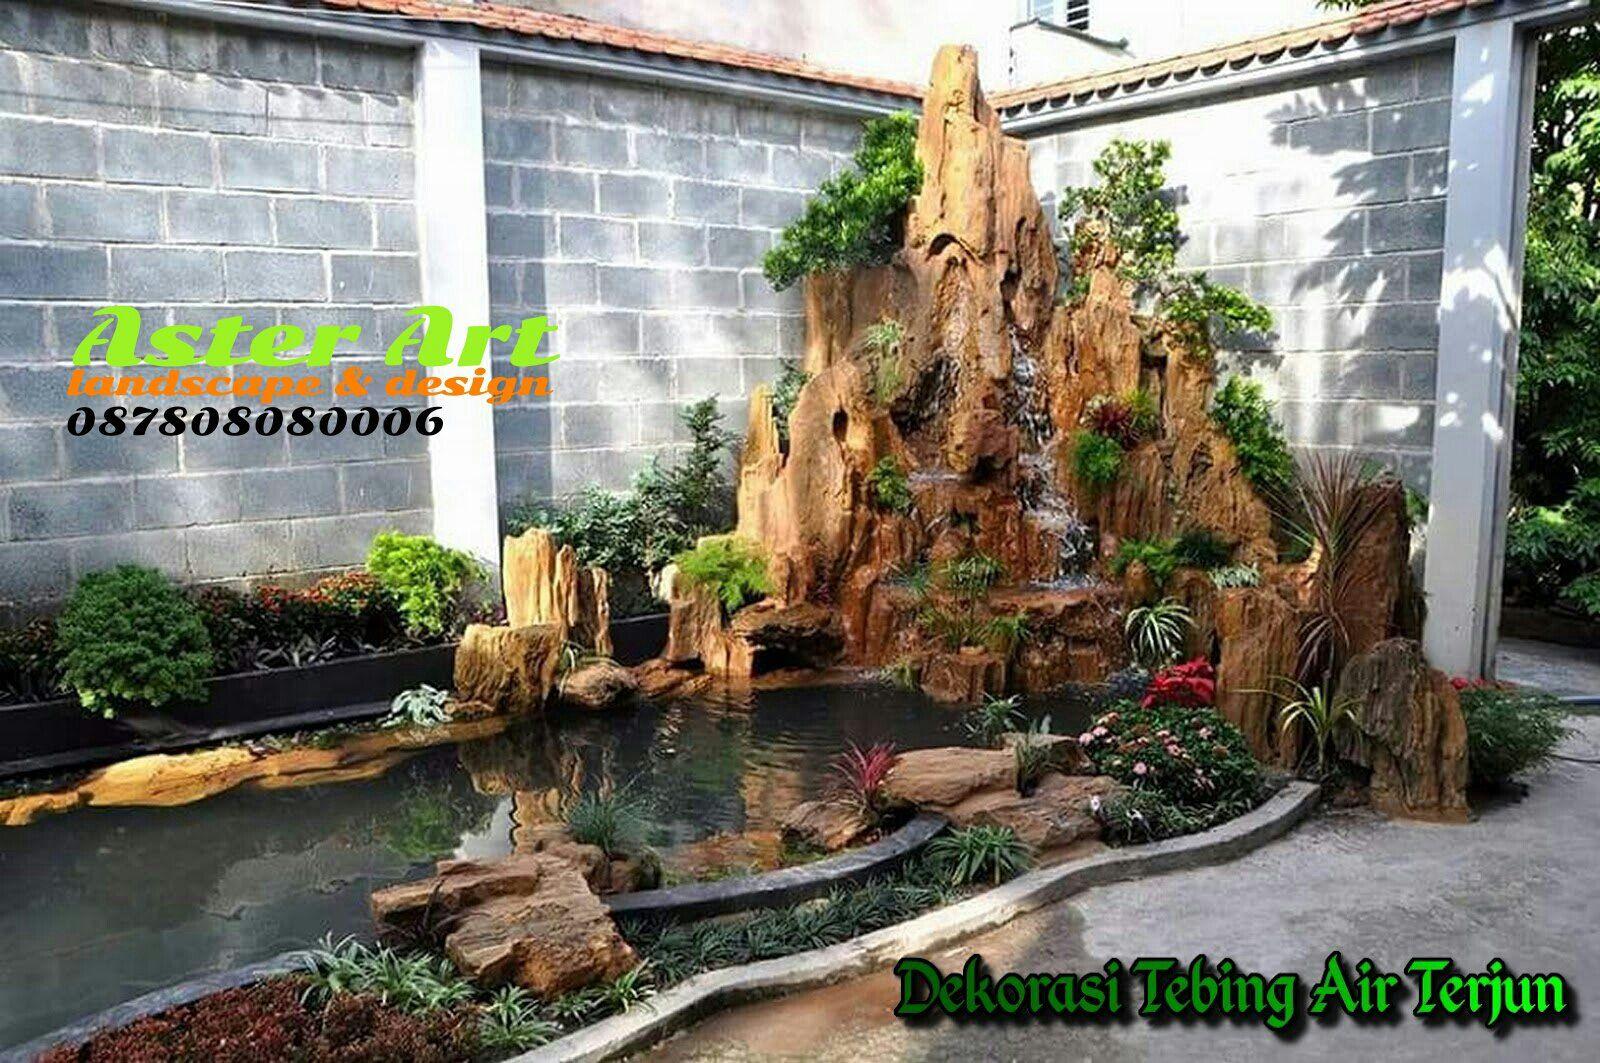 Jasa Tukang Taman Jakarta Jasa Pembuatan Taman Jabodetabek Aster Art Landscape Design Jasa Pembuatan Taman Hias Vertical Di 2020 Taman Taman Vertikal Air Terjun